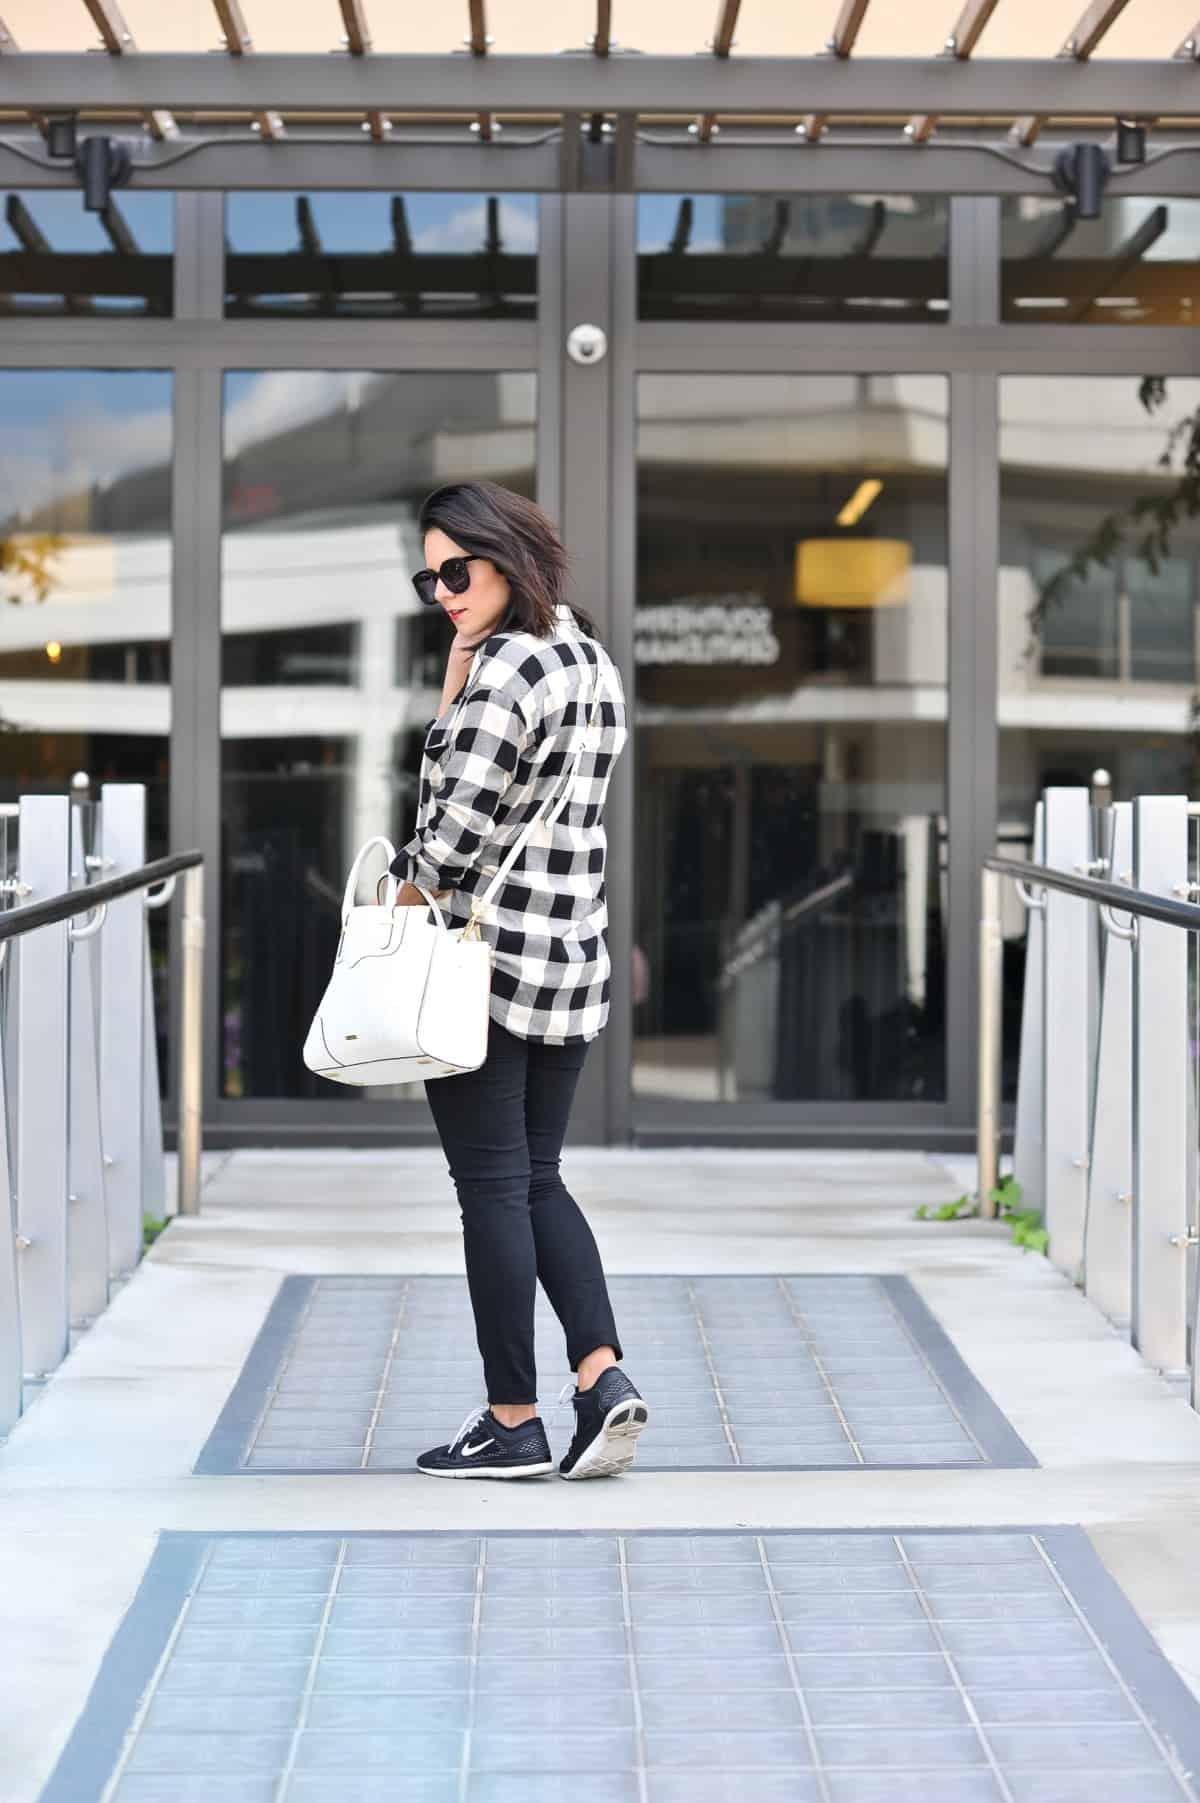 Black and white, buffalo plaid, fall outfit ideas via @mystylevita